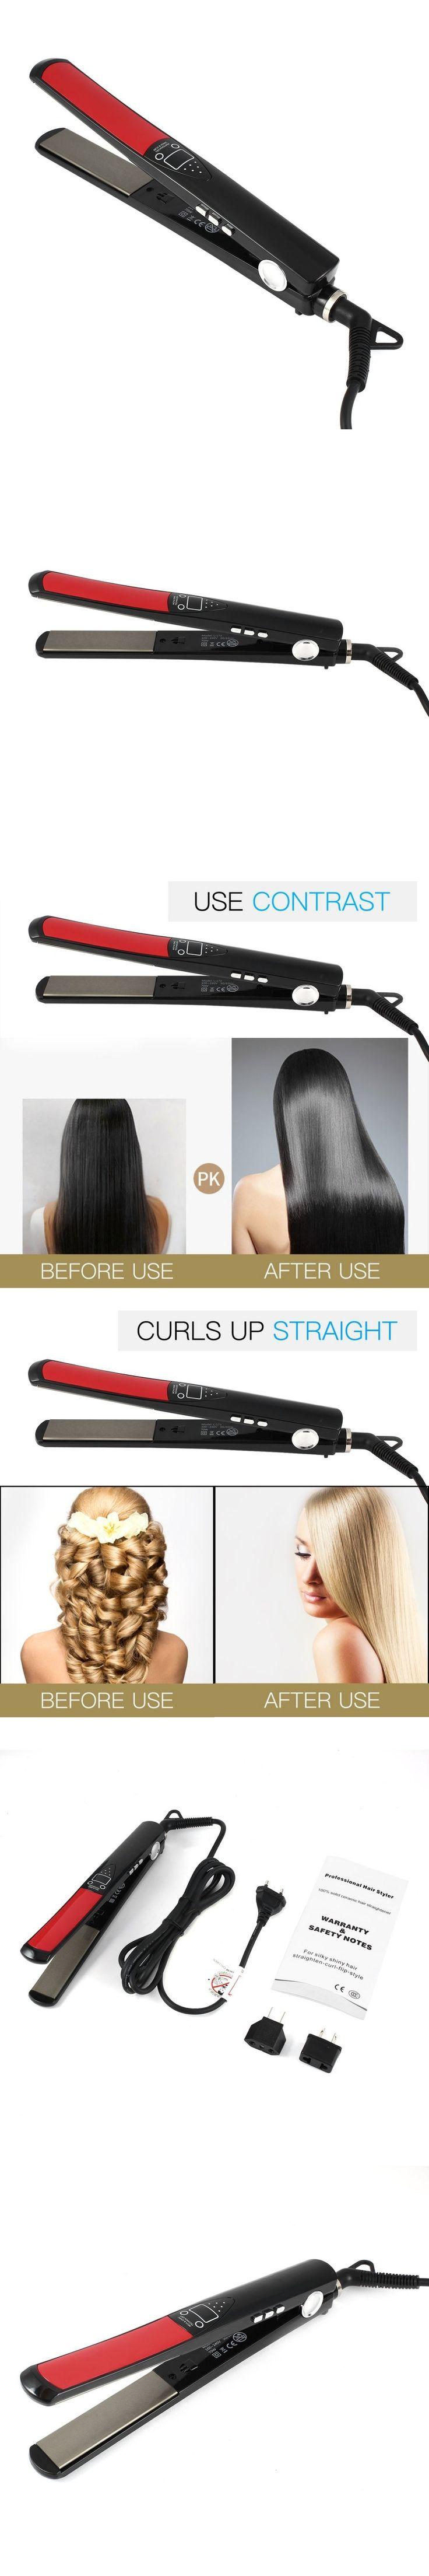 L173 Professional Hair Styler Solid Ceramic Hair Straightener for Silky Shiny Hair Straighten-Curl-Flip Style Home Hair Salon